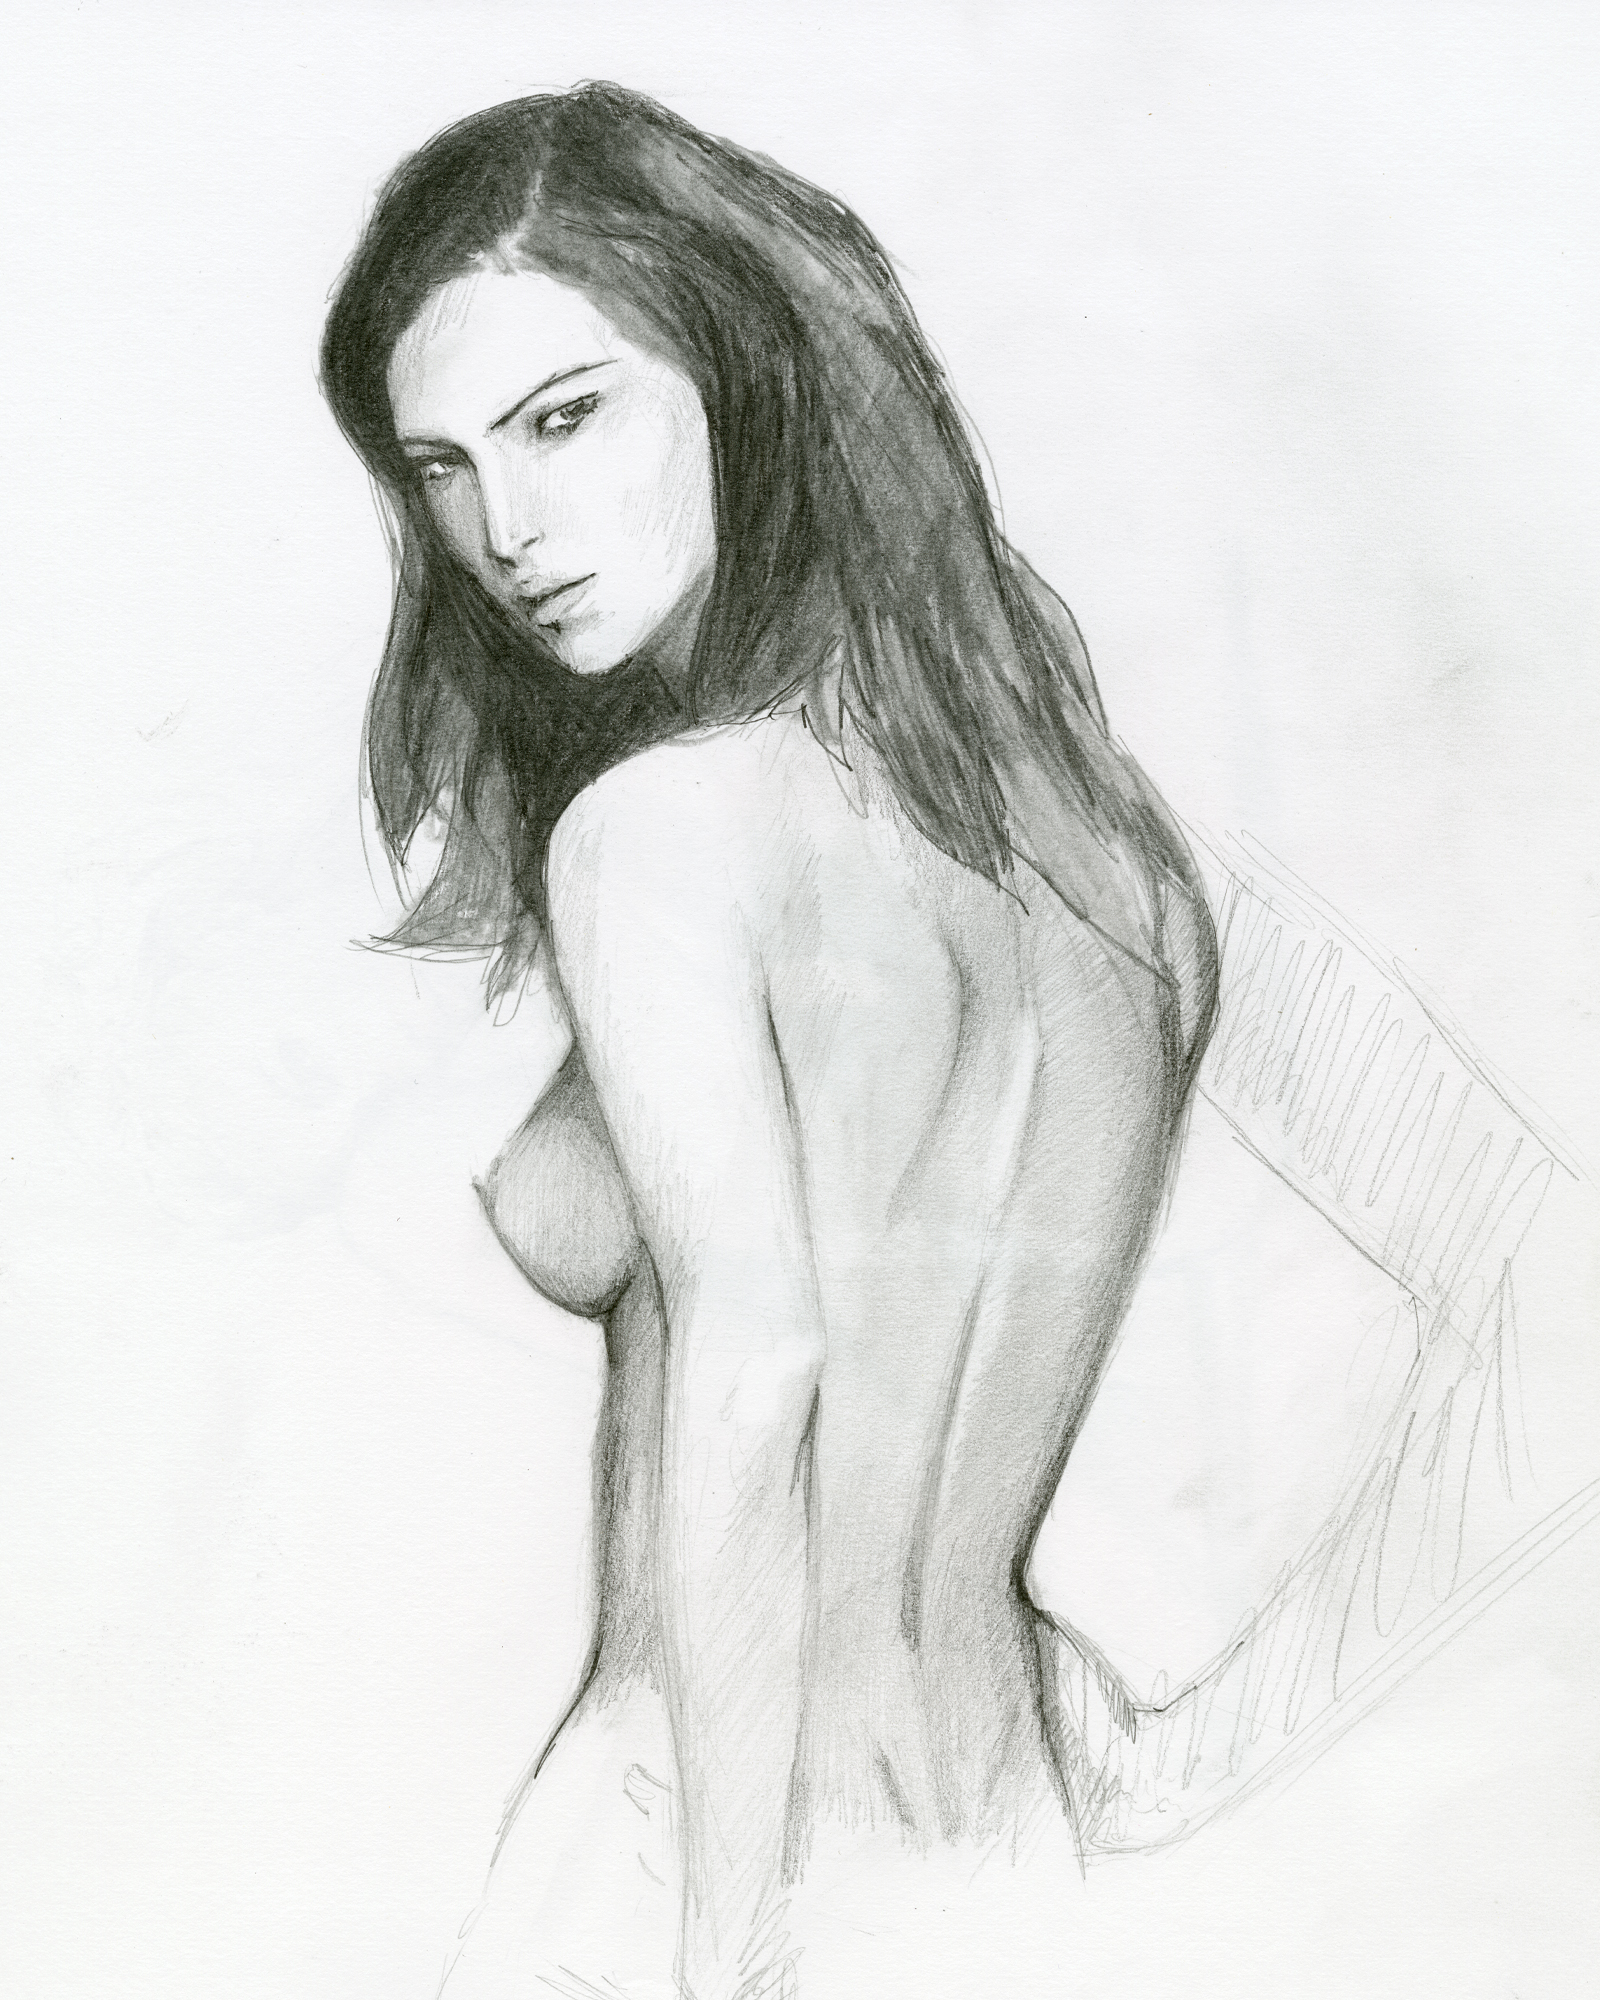 sketch-girlback_david-jackowski_alvatron-studio.jpg